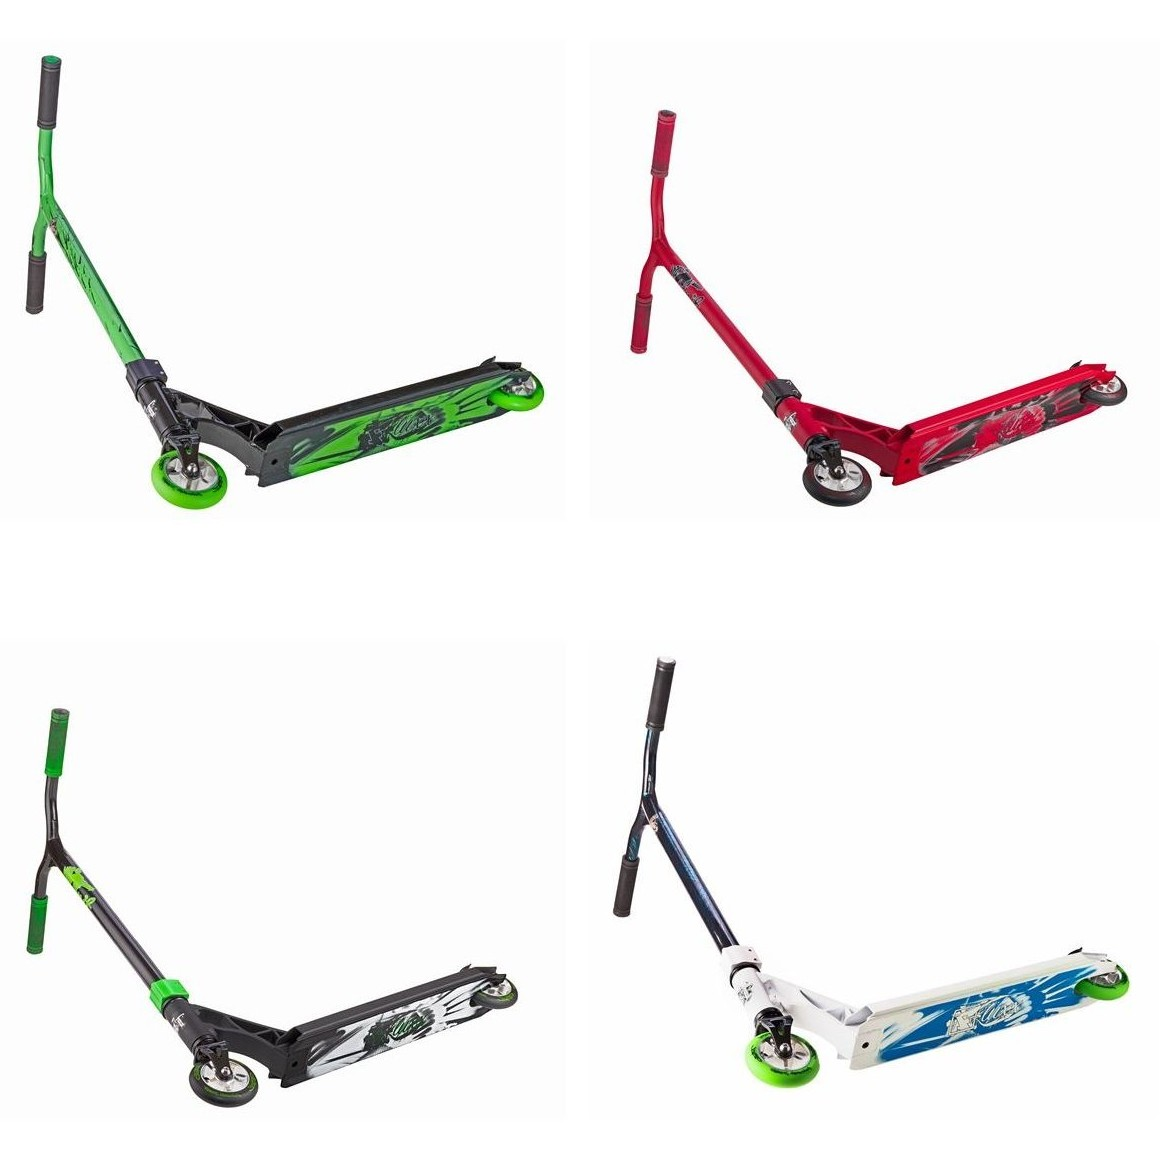 2017 Grit Fluxx complete scooters